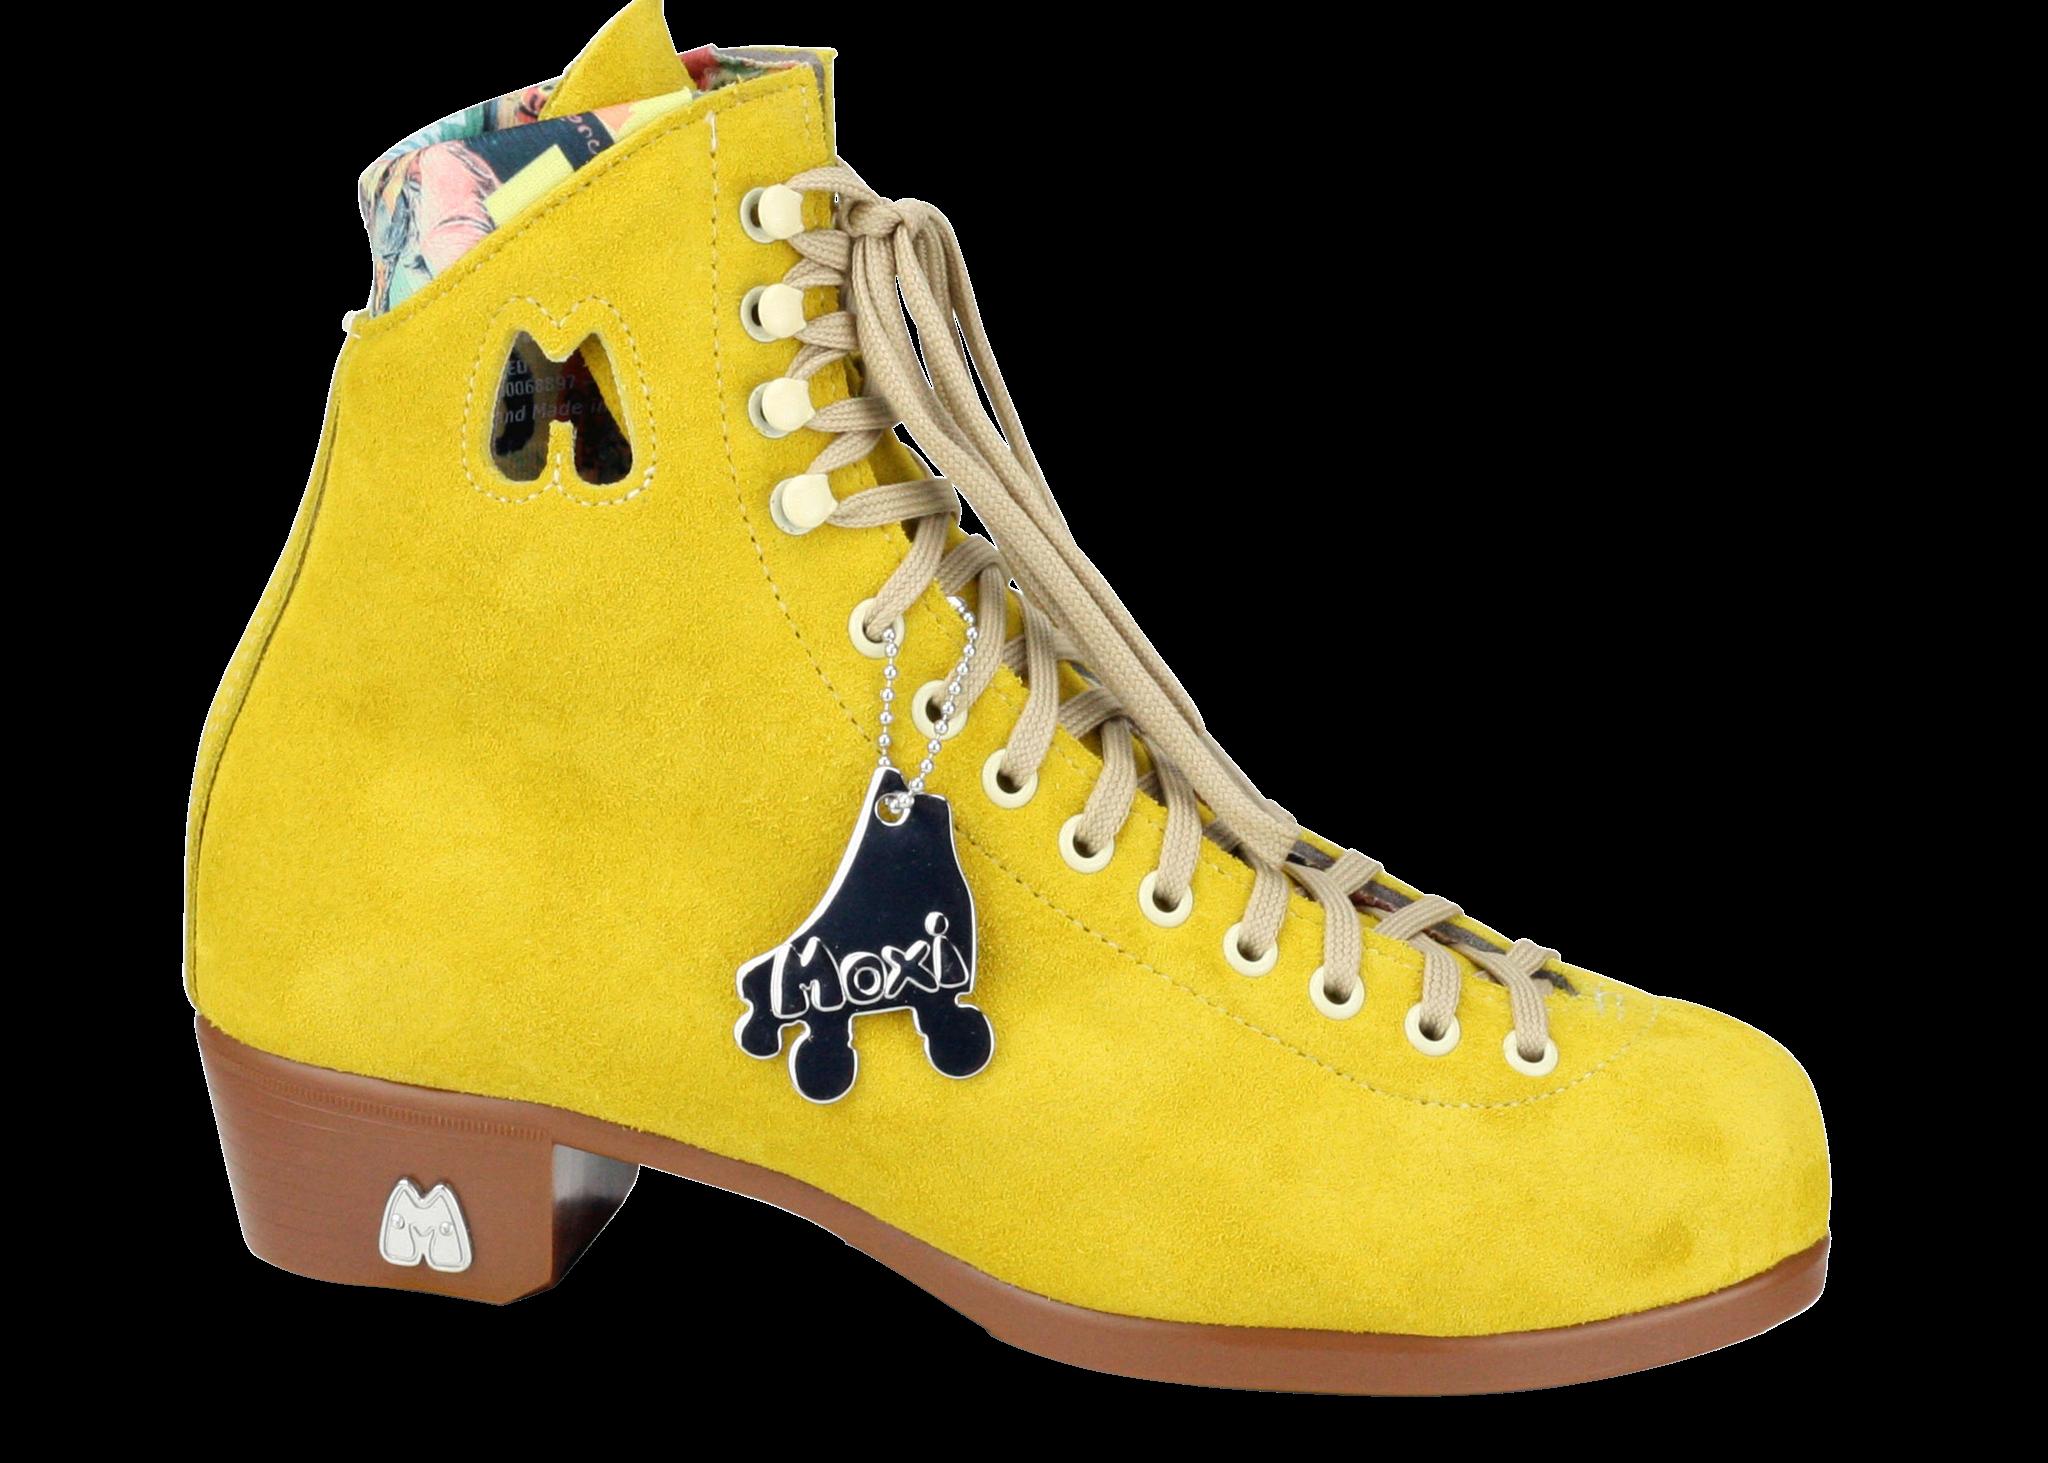 Moxi Lolly Pineapple Yellow